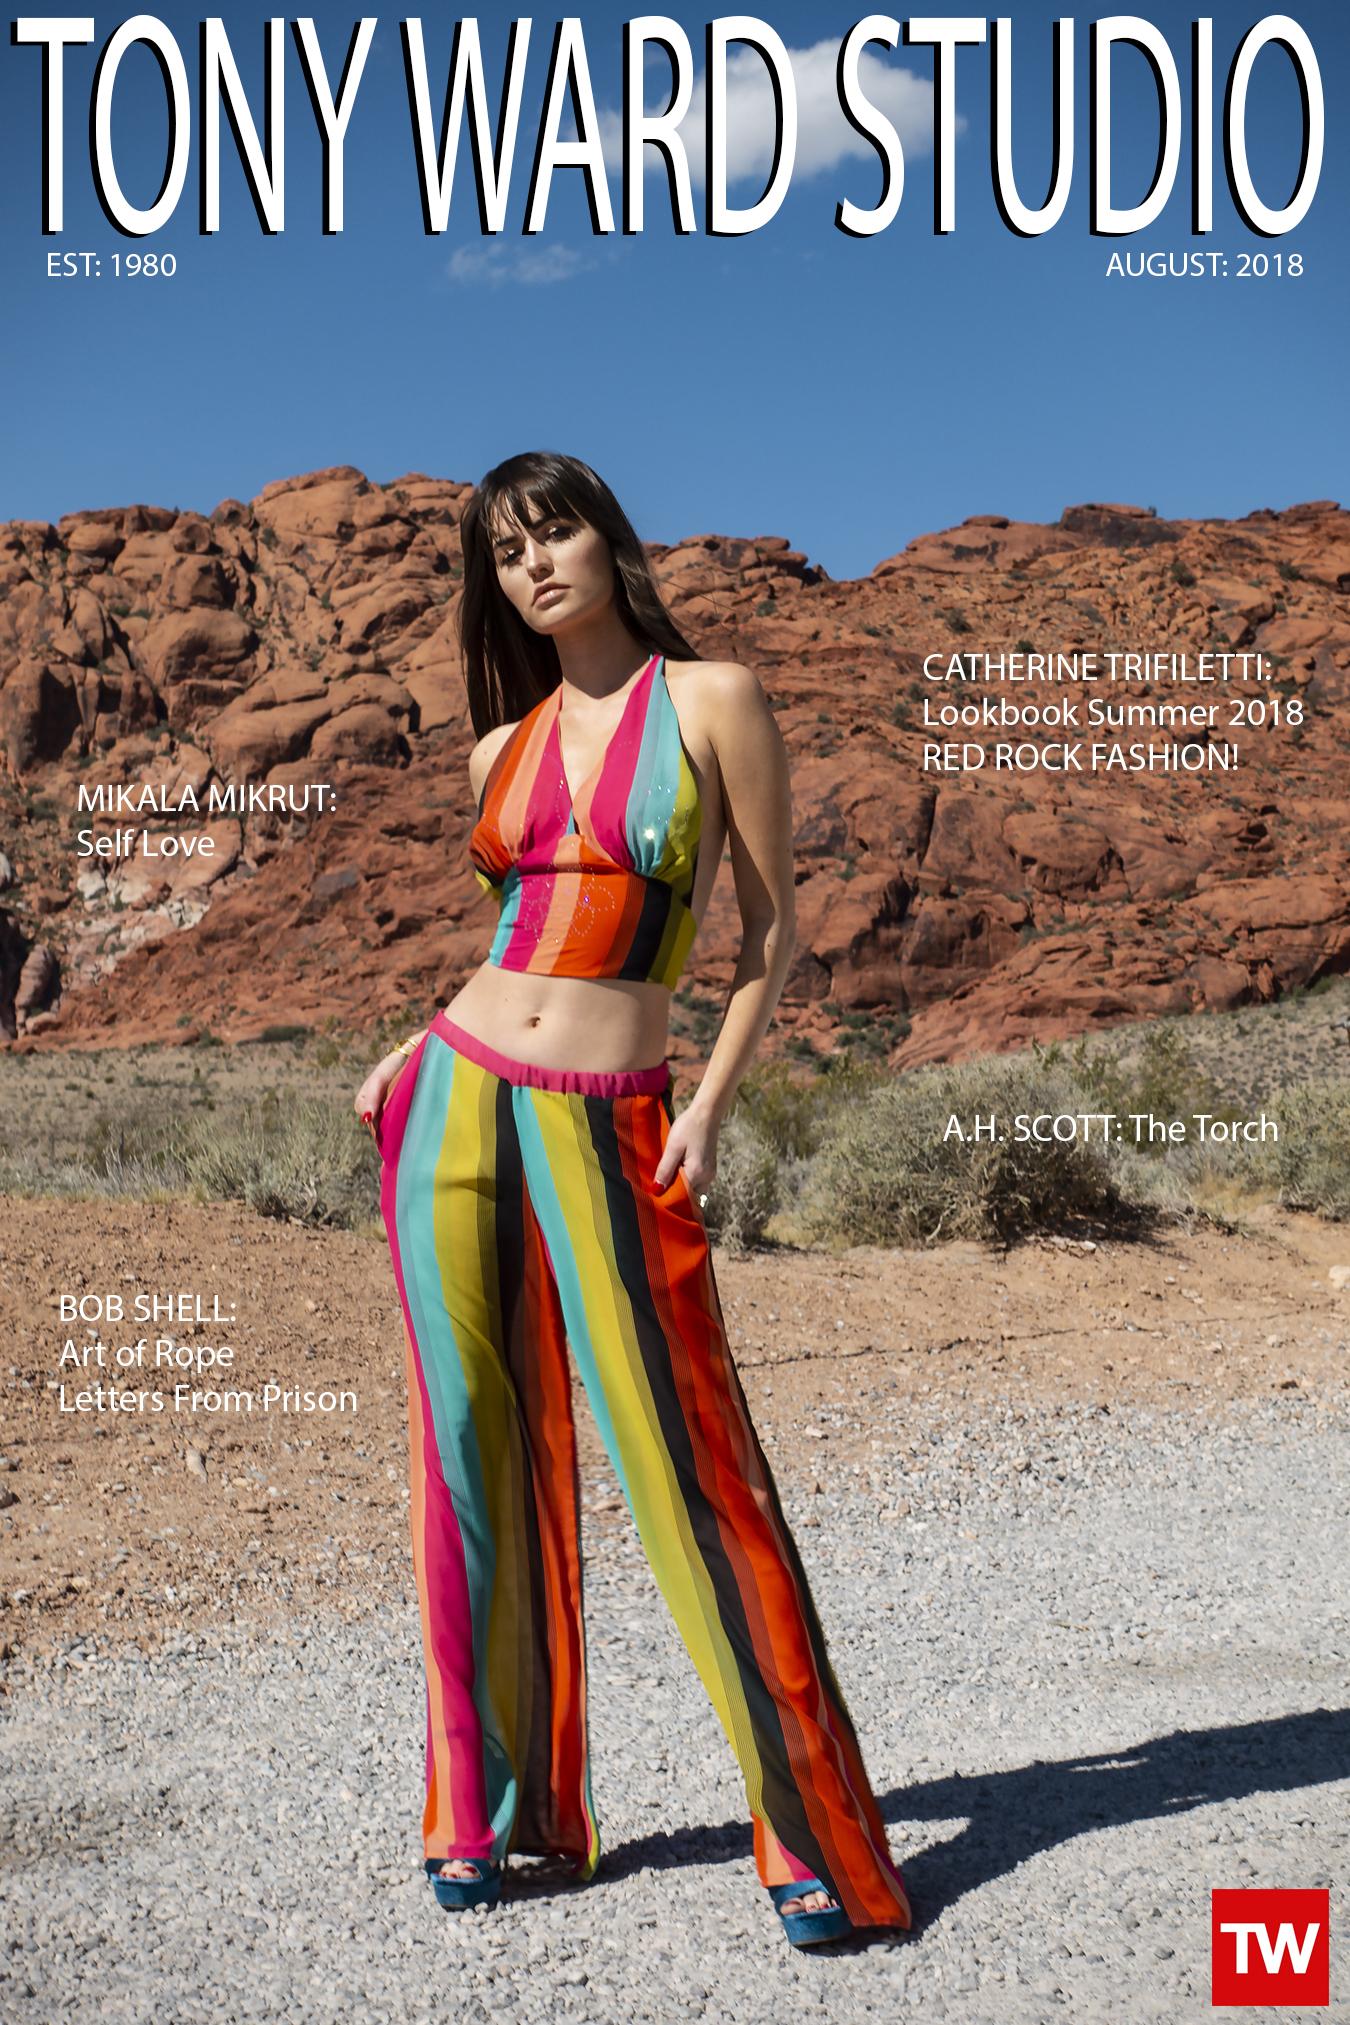 Tony Ward Studio Catherine Trifiletti Design Las Vegas Cover Art